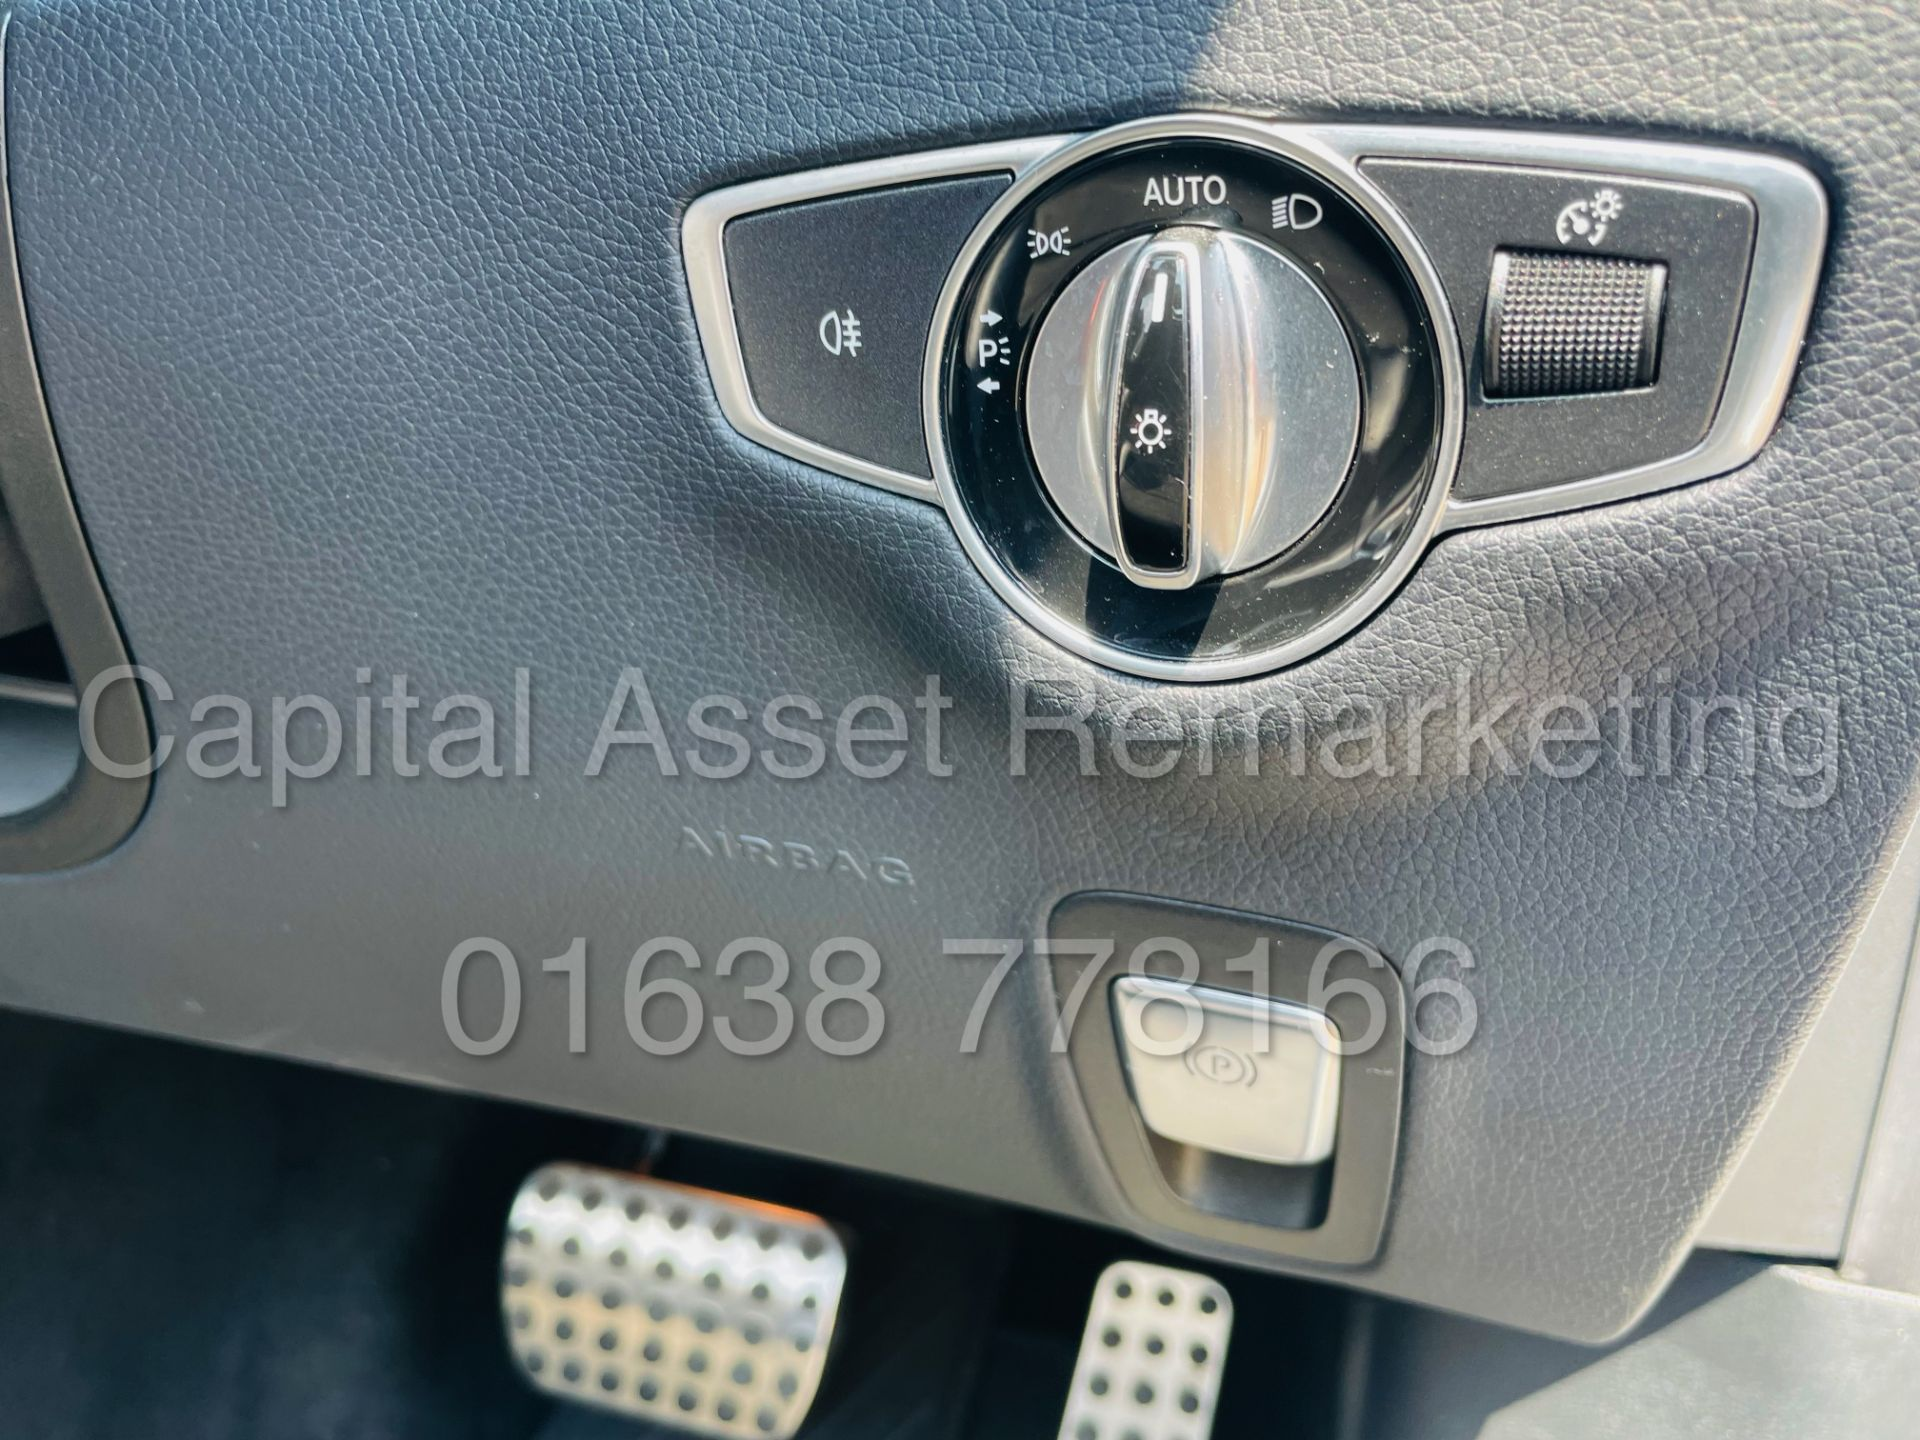 MERCEDES-BENZ E220d *AMG LINE PREMIUM - CABRIOLET* (2018 - EURO 6) '9G AUTO - LEATHER - SAT NAV' - Image 51 of 63